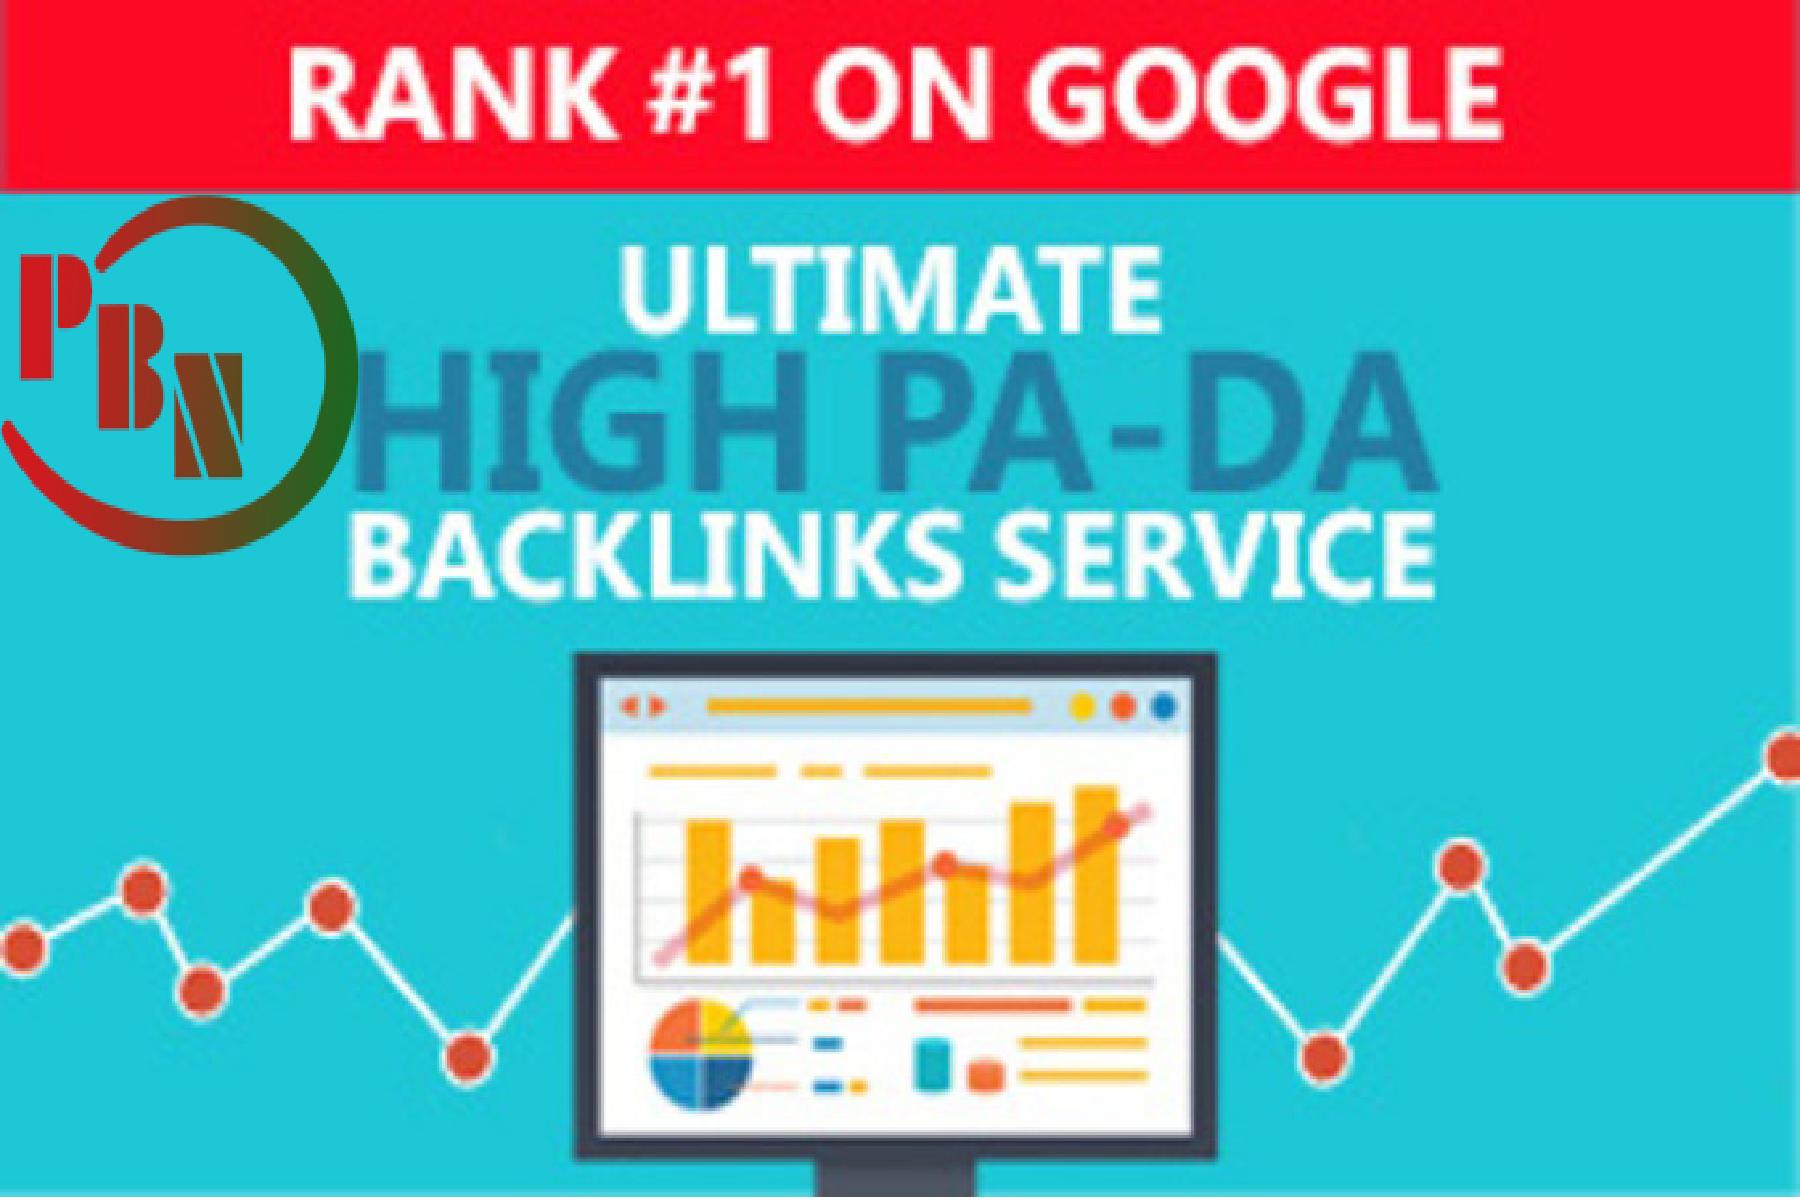 5 high tf cf permanent homepage PBN Backlinks